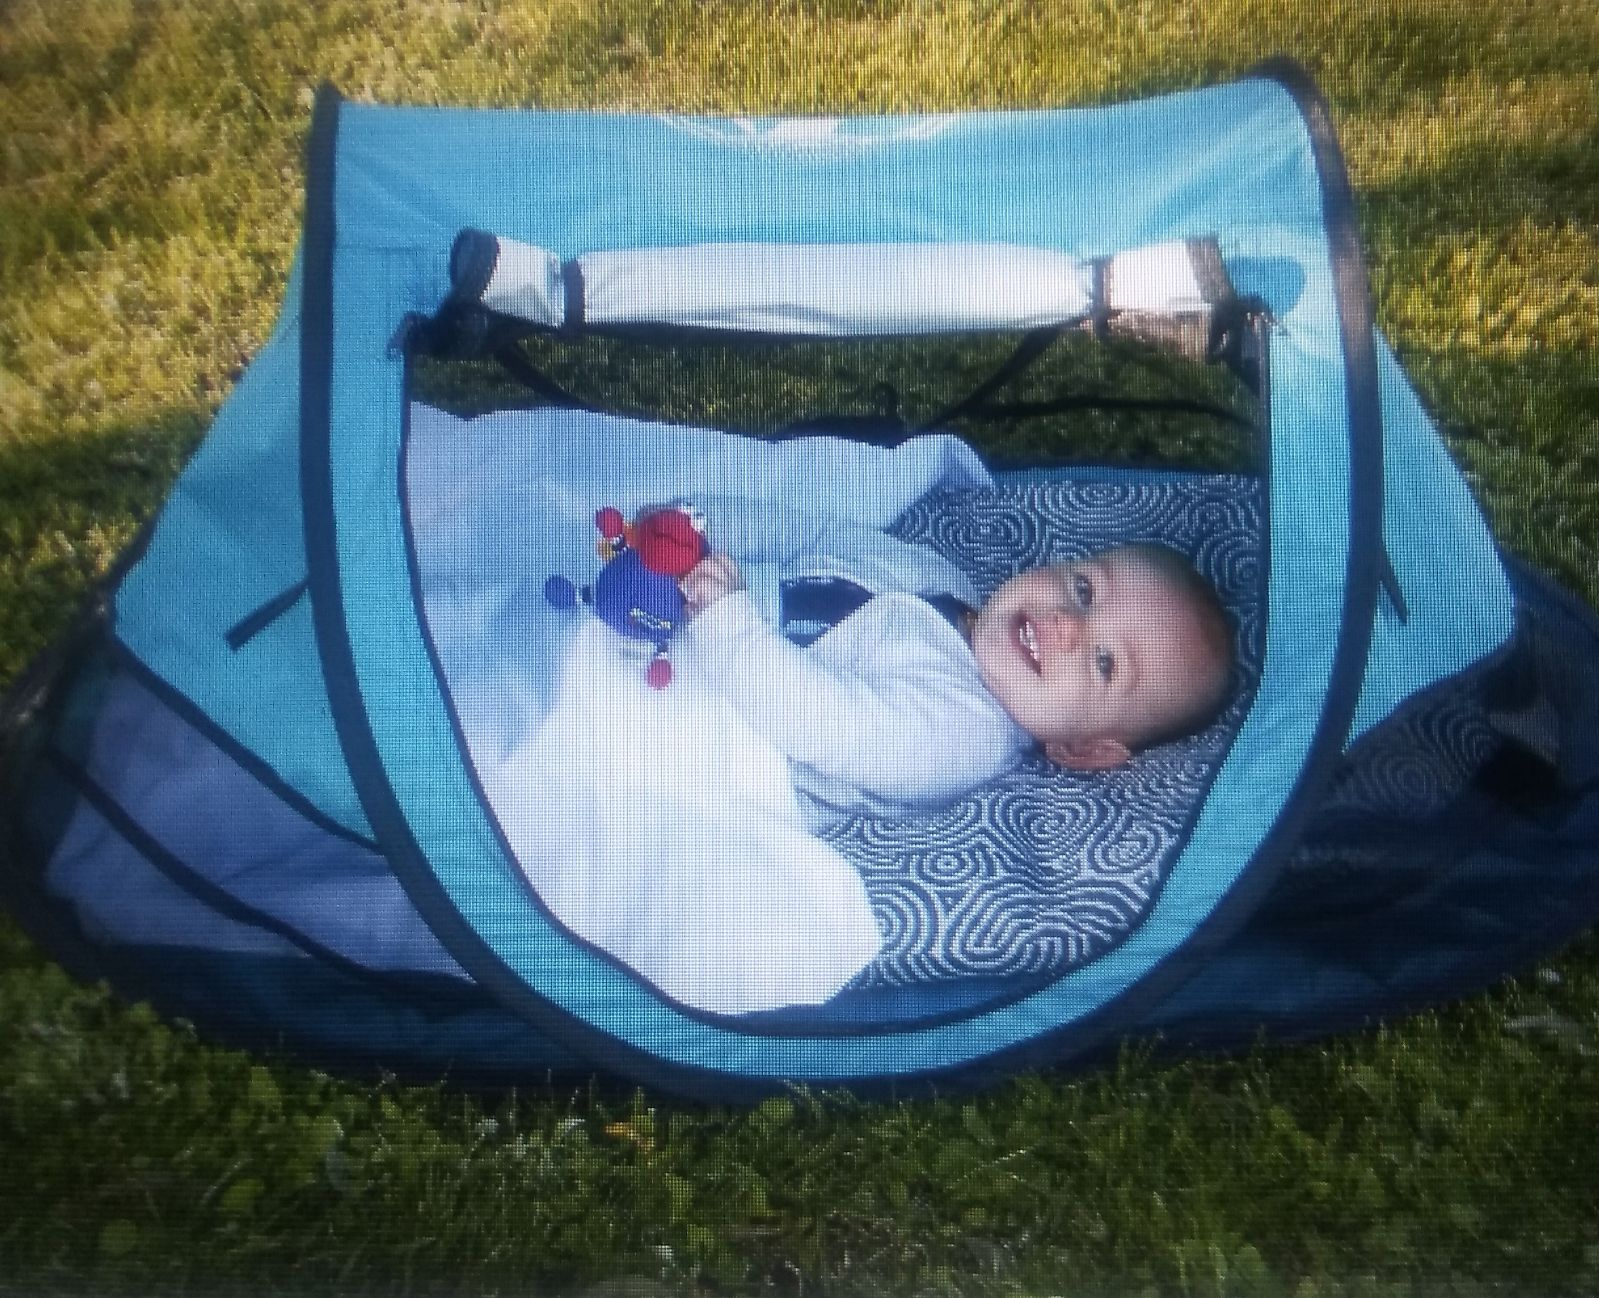 Baby, Toddler Pop up Tent